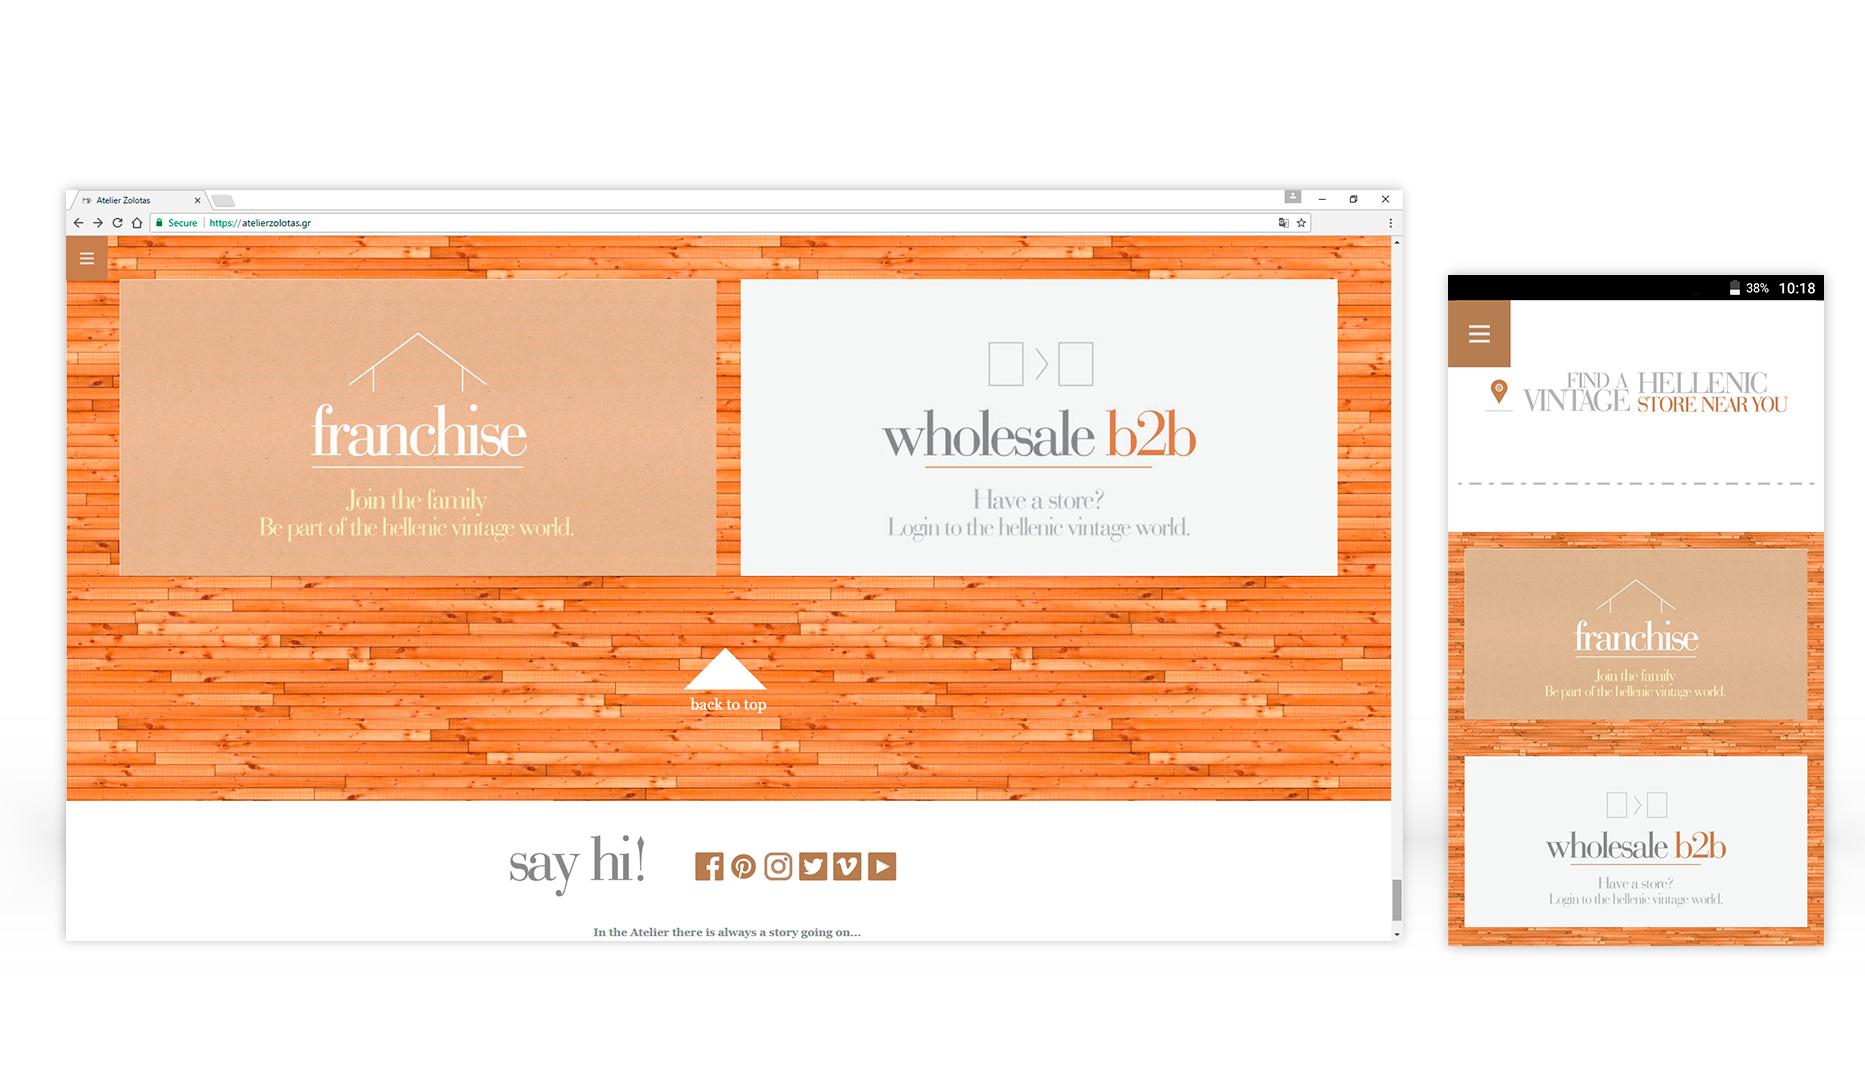 web design & development atelier Zolotas • adeadpixel